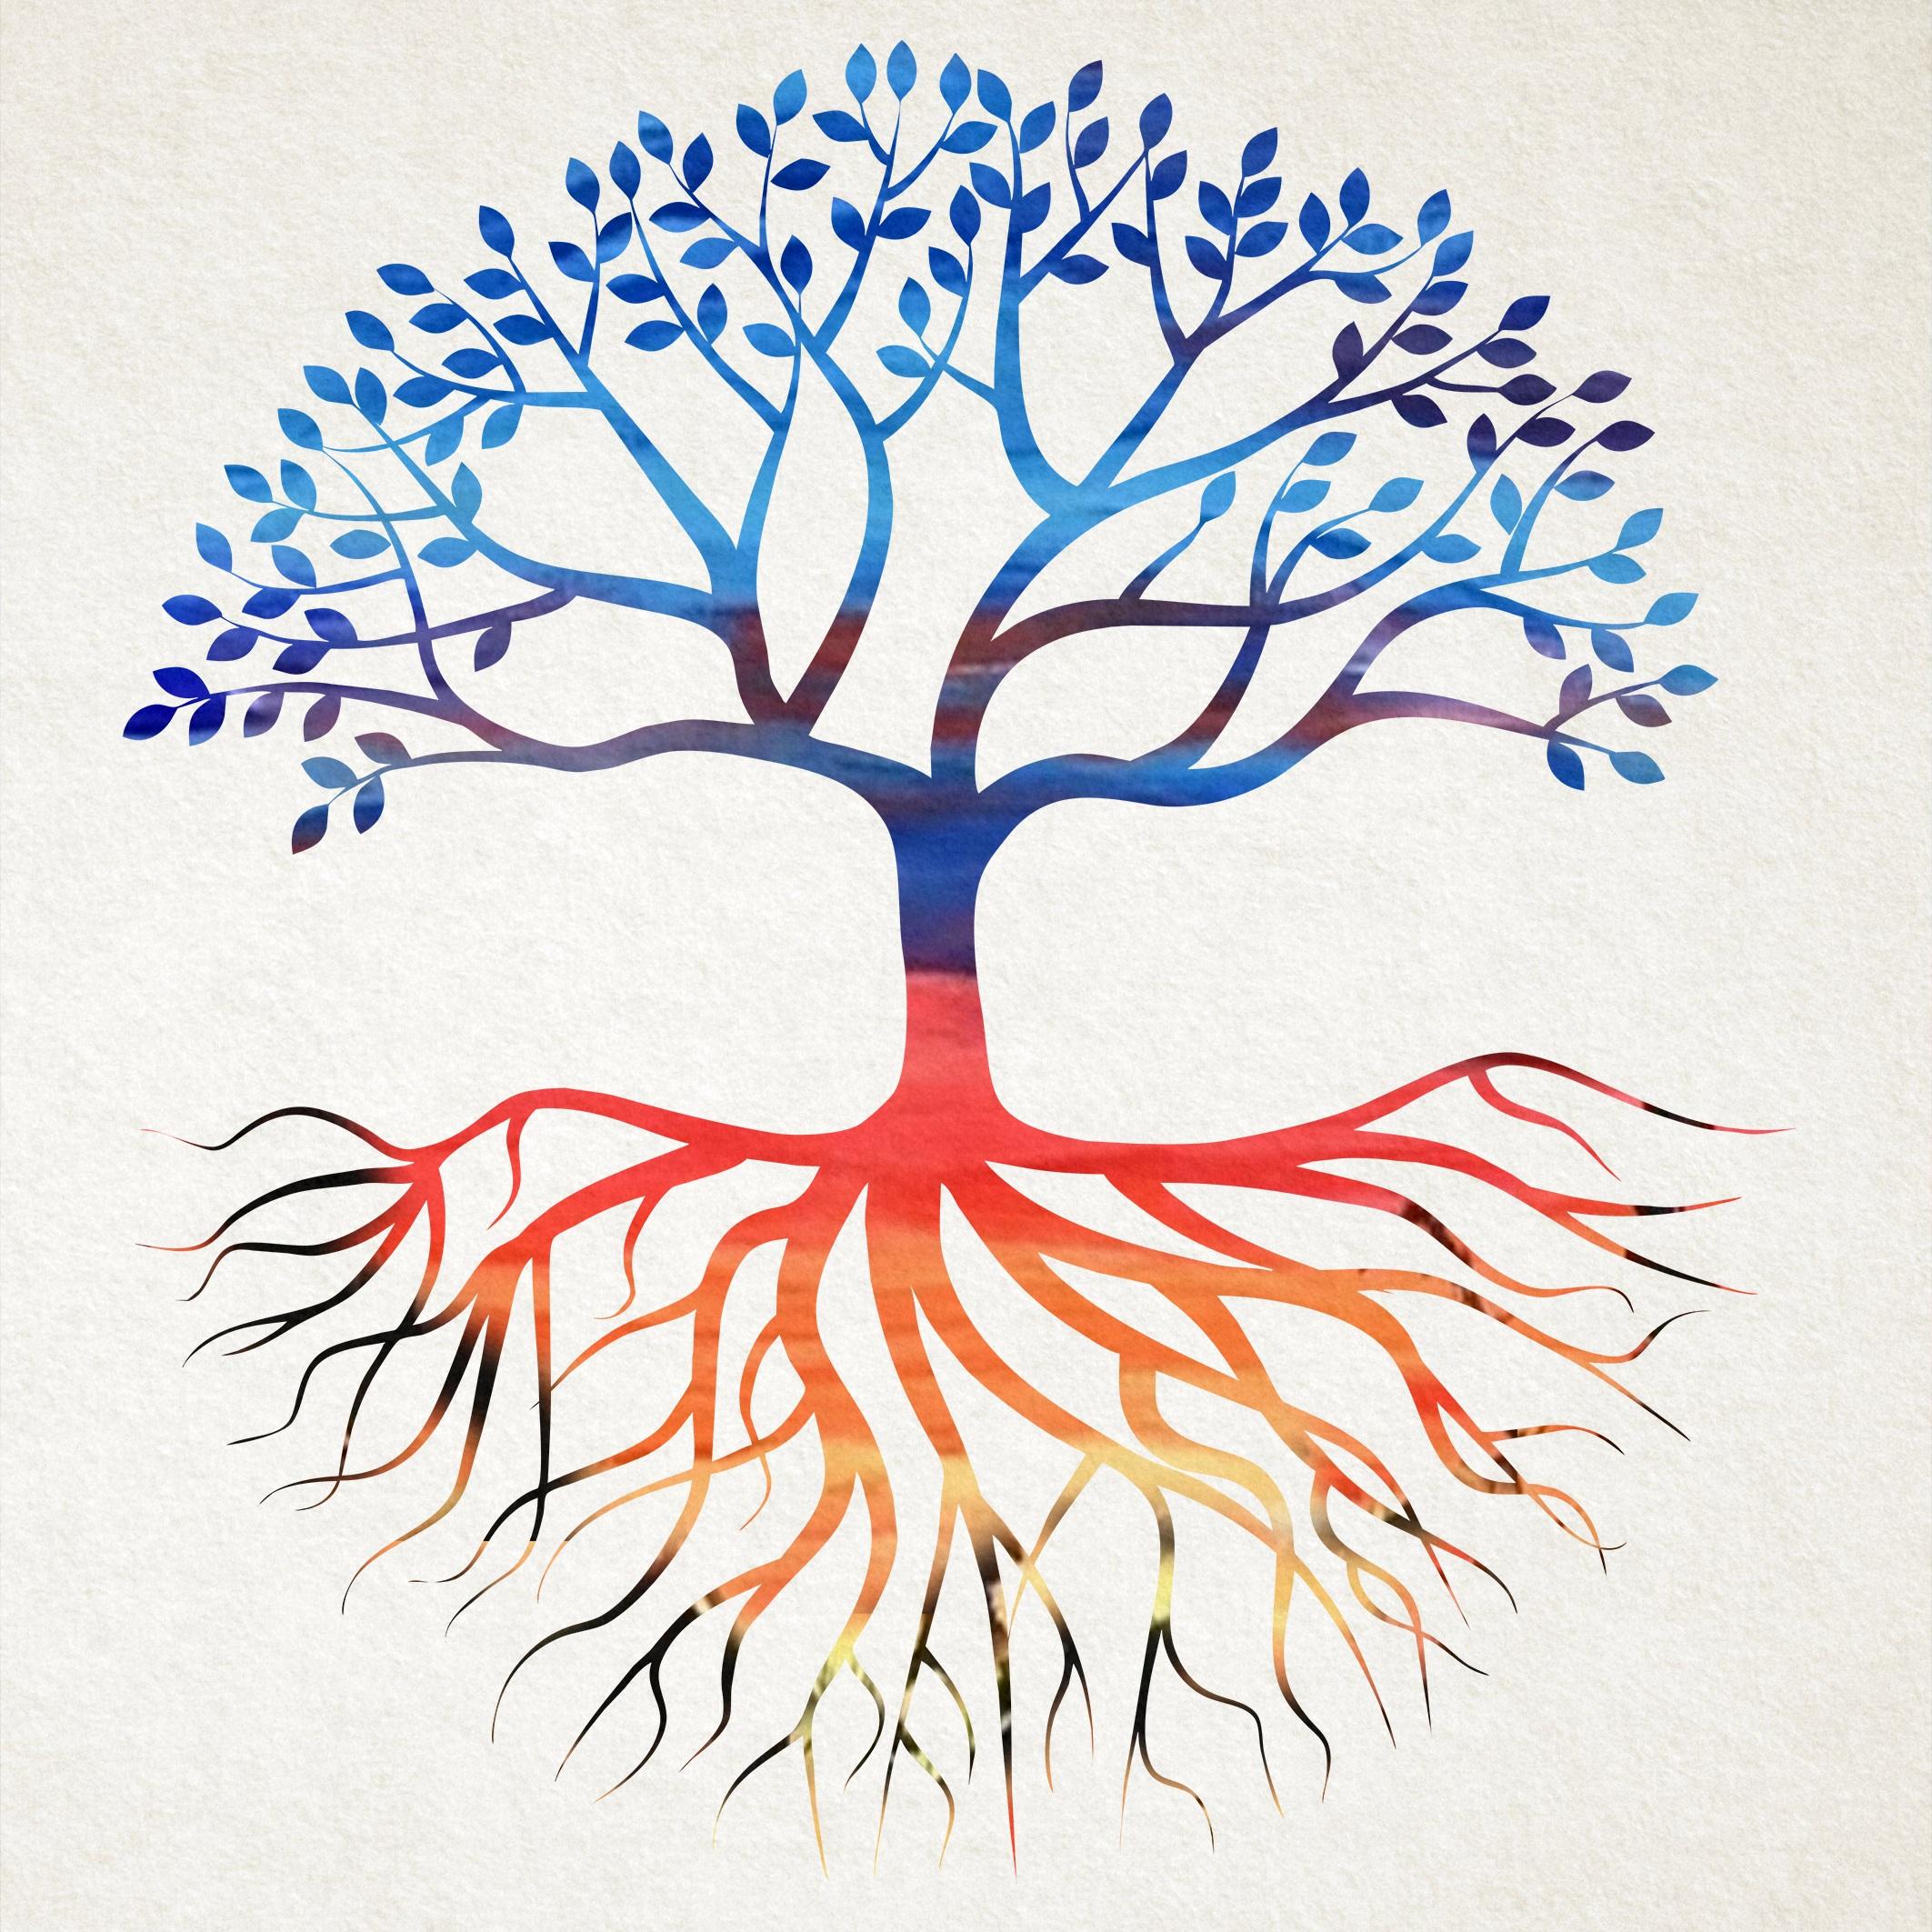 apod+tree.jpg